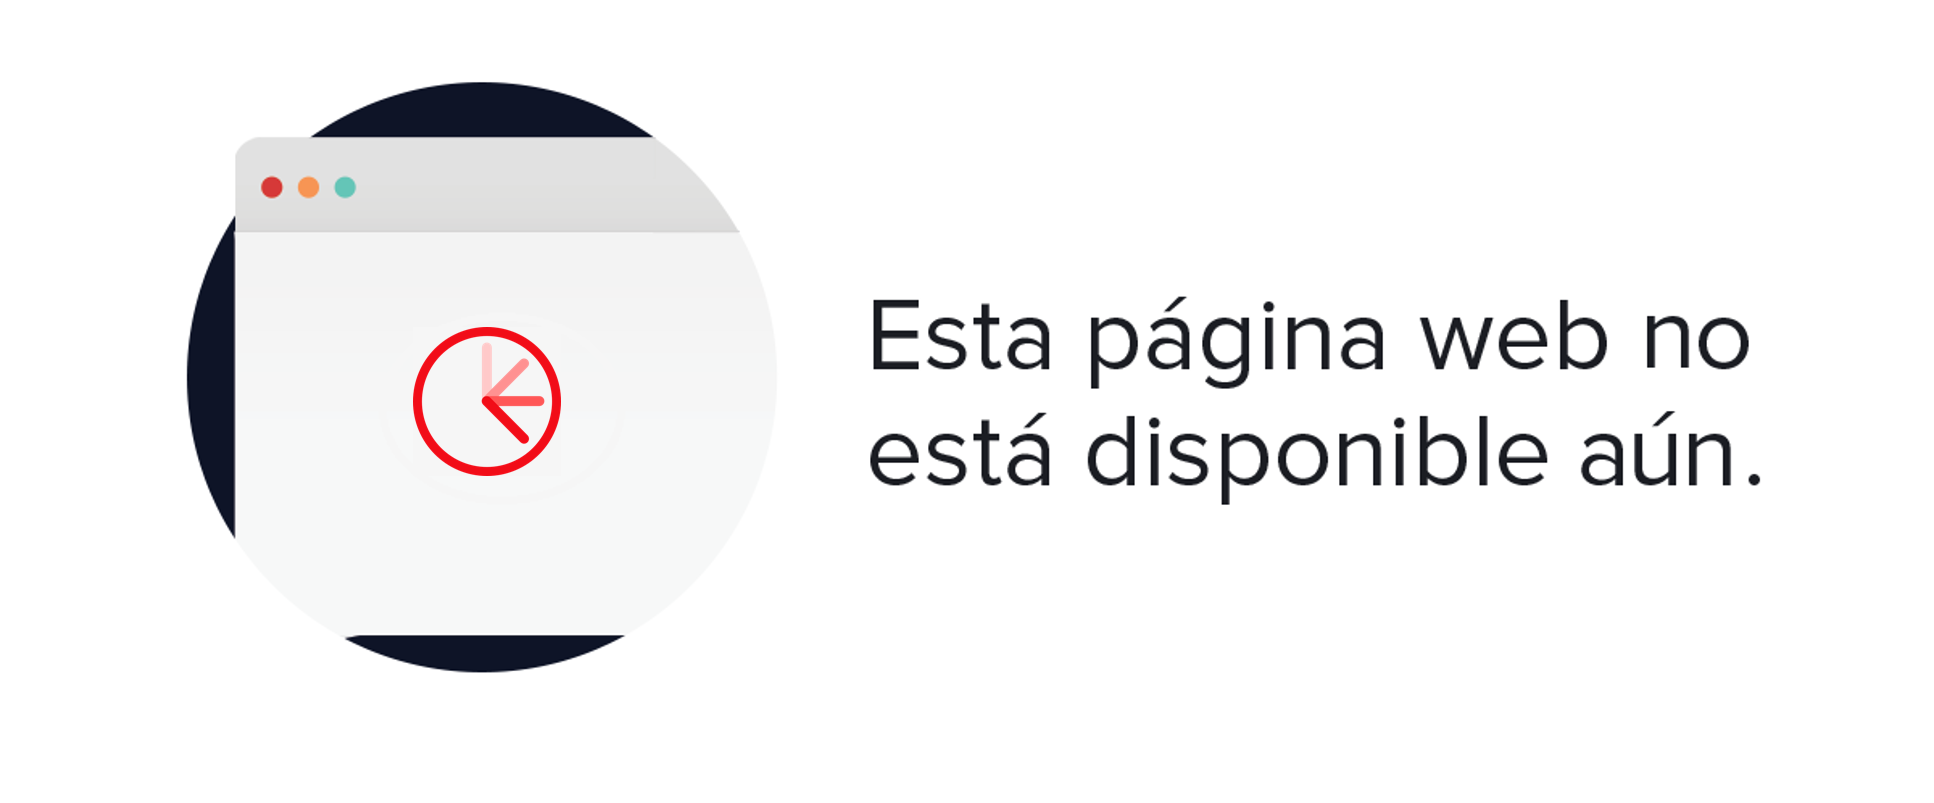 OXXO - Pantalón de mujer OXXO pitillo con 5 bolsillos Naranja 8681613077683 - FJFNHJX